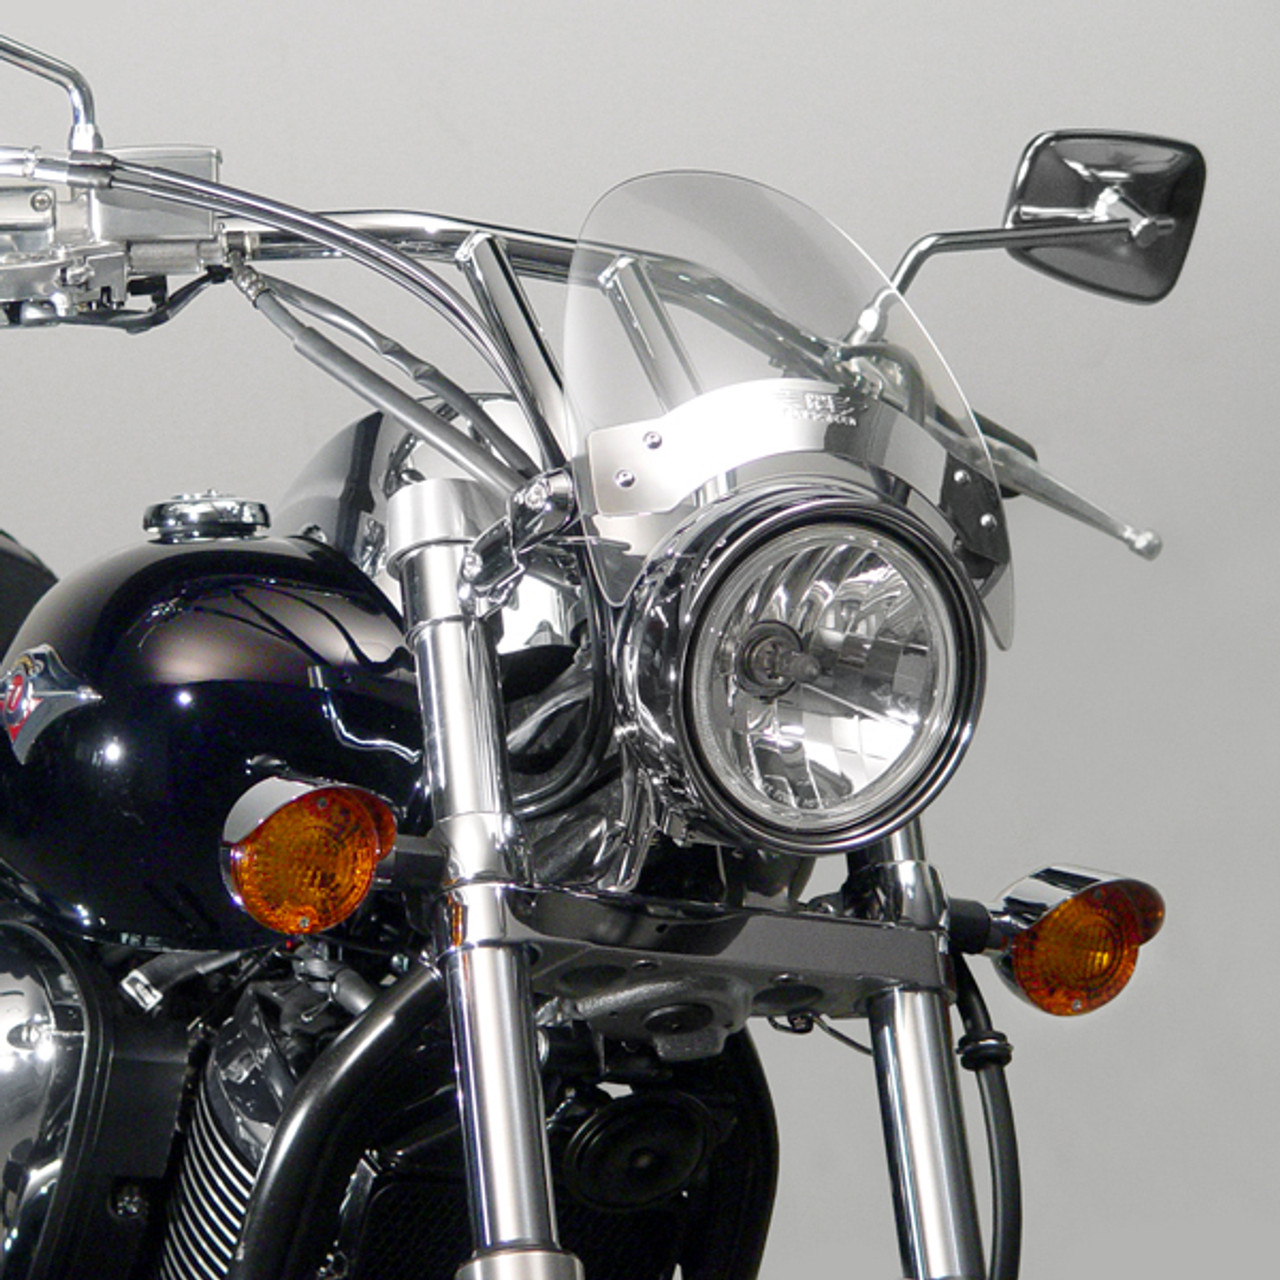 Fly Screen Windscreen Windshield Honda VT VTX VF CMX CB Shadow Spirit ACE Sabre Stateline Magna Rebel , Smoke